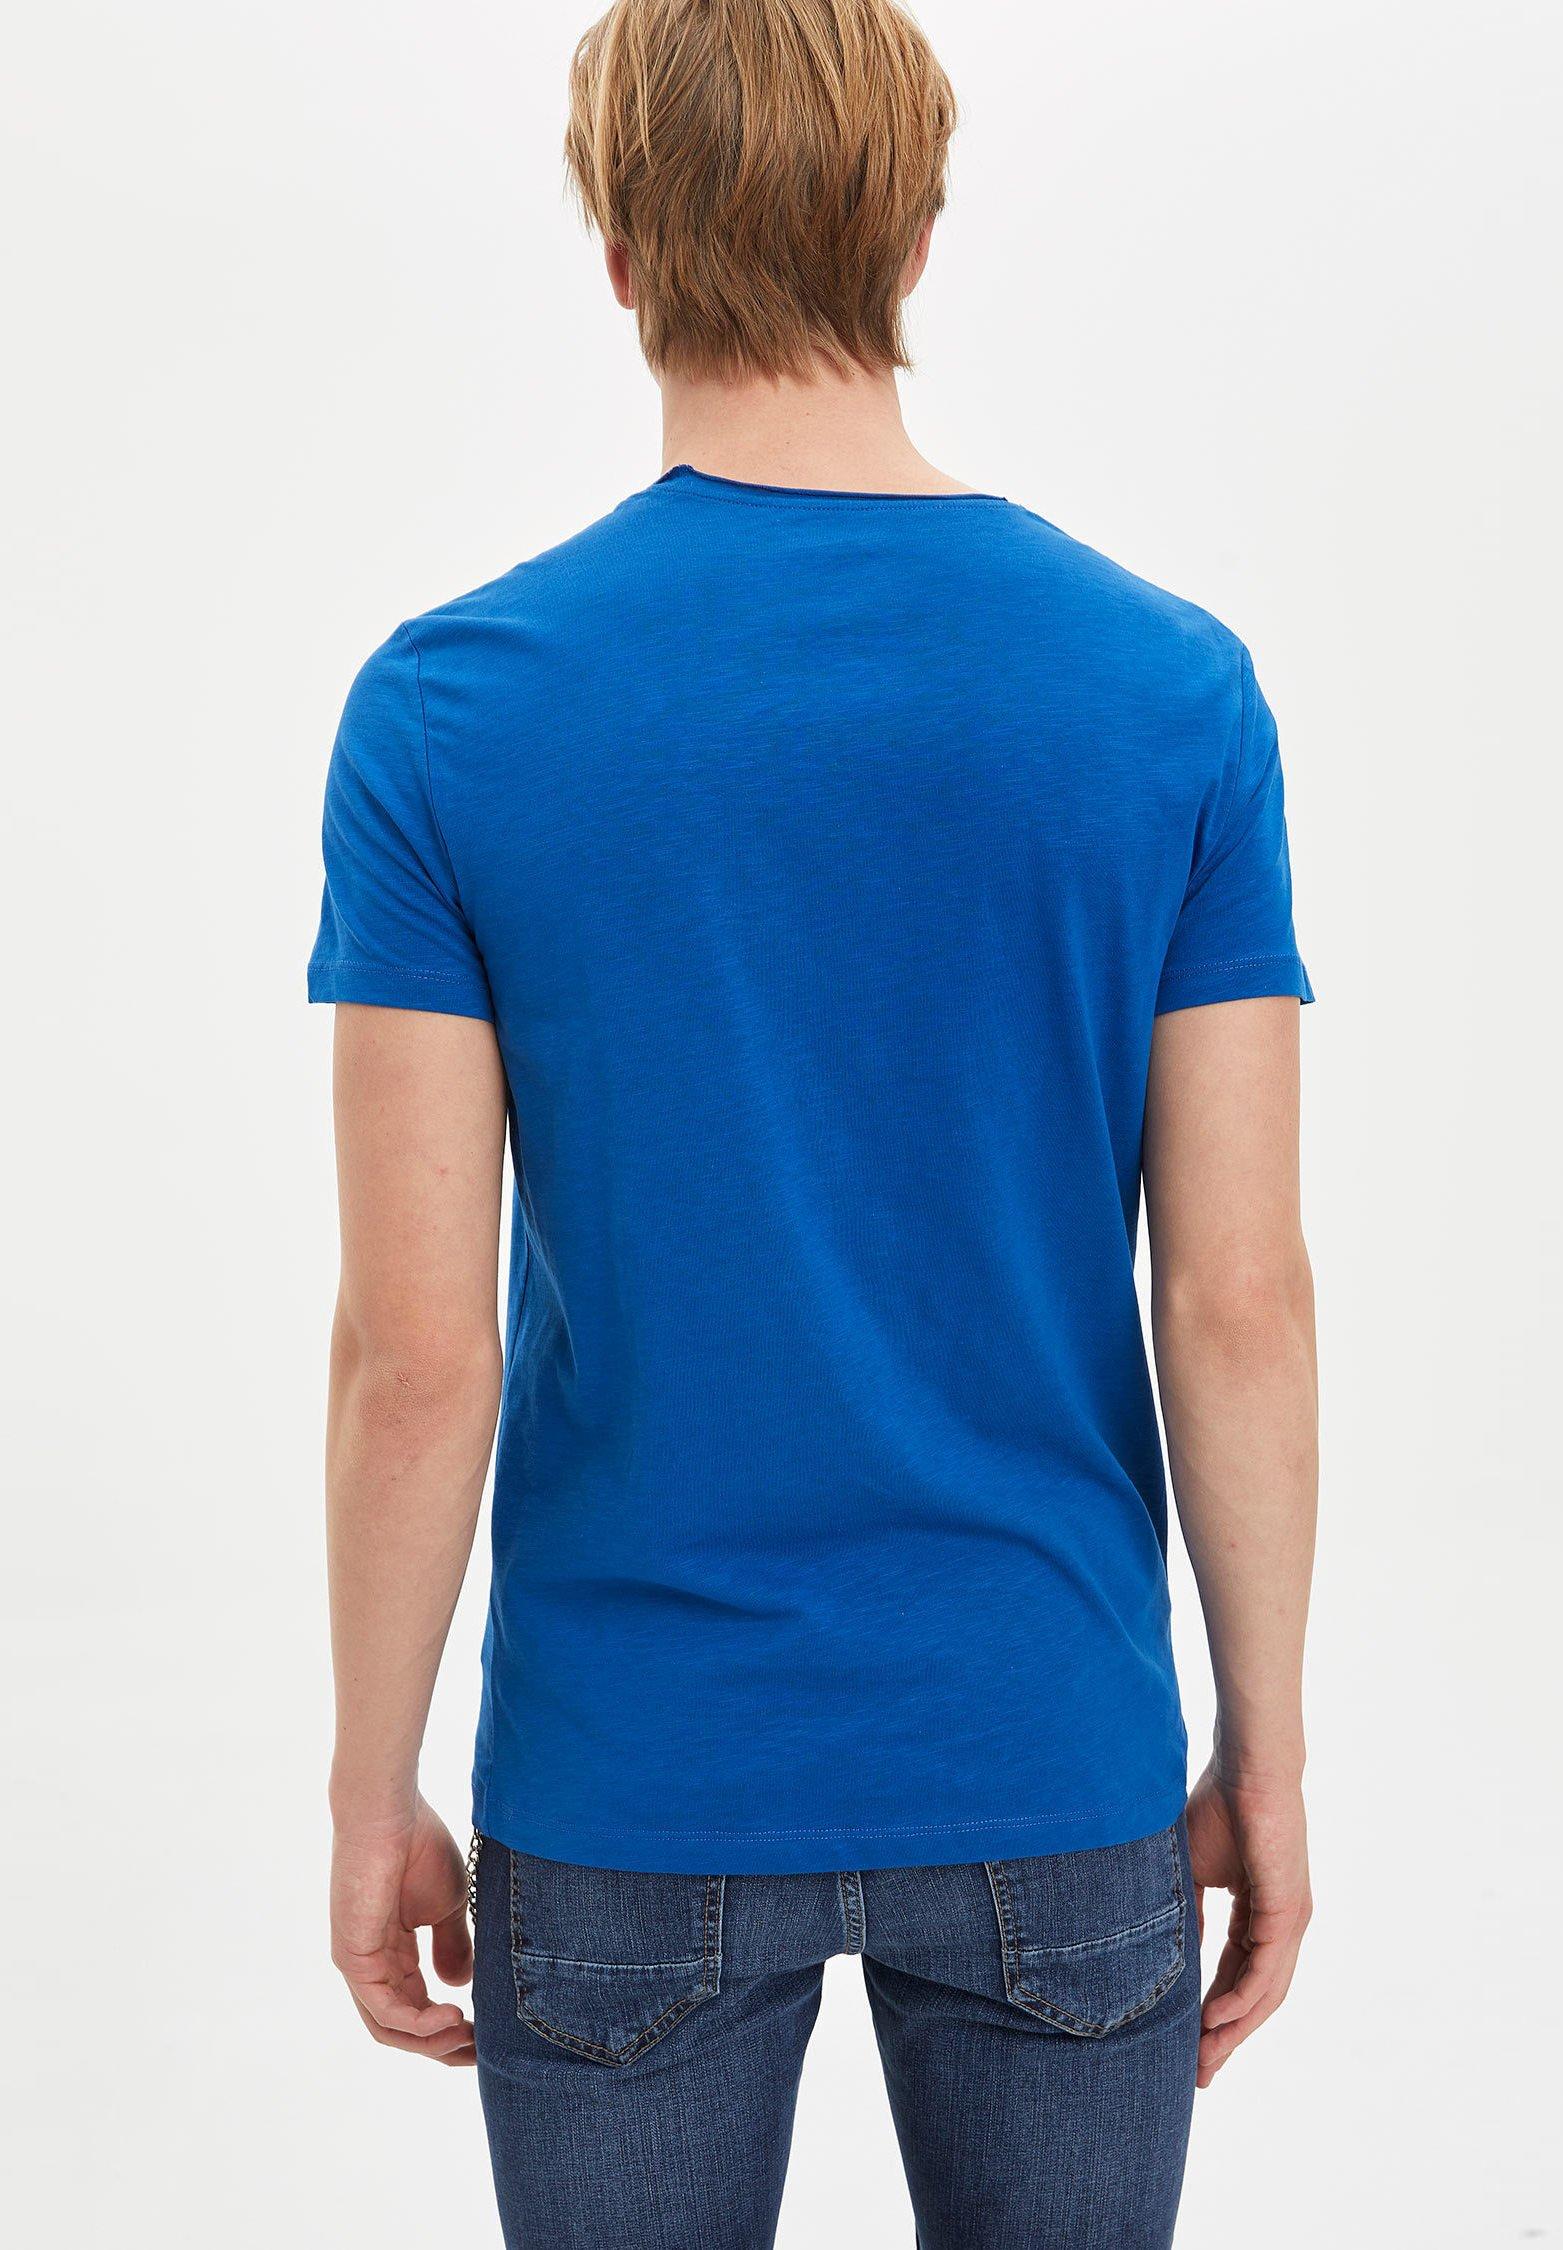 DeFacto Basic T-shirt - blue jXBBp